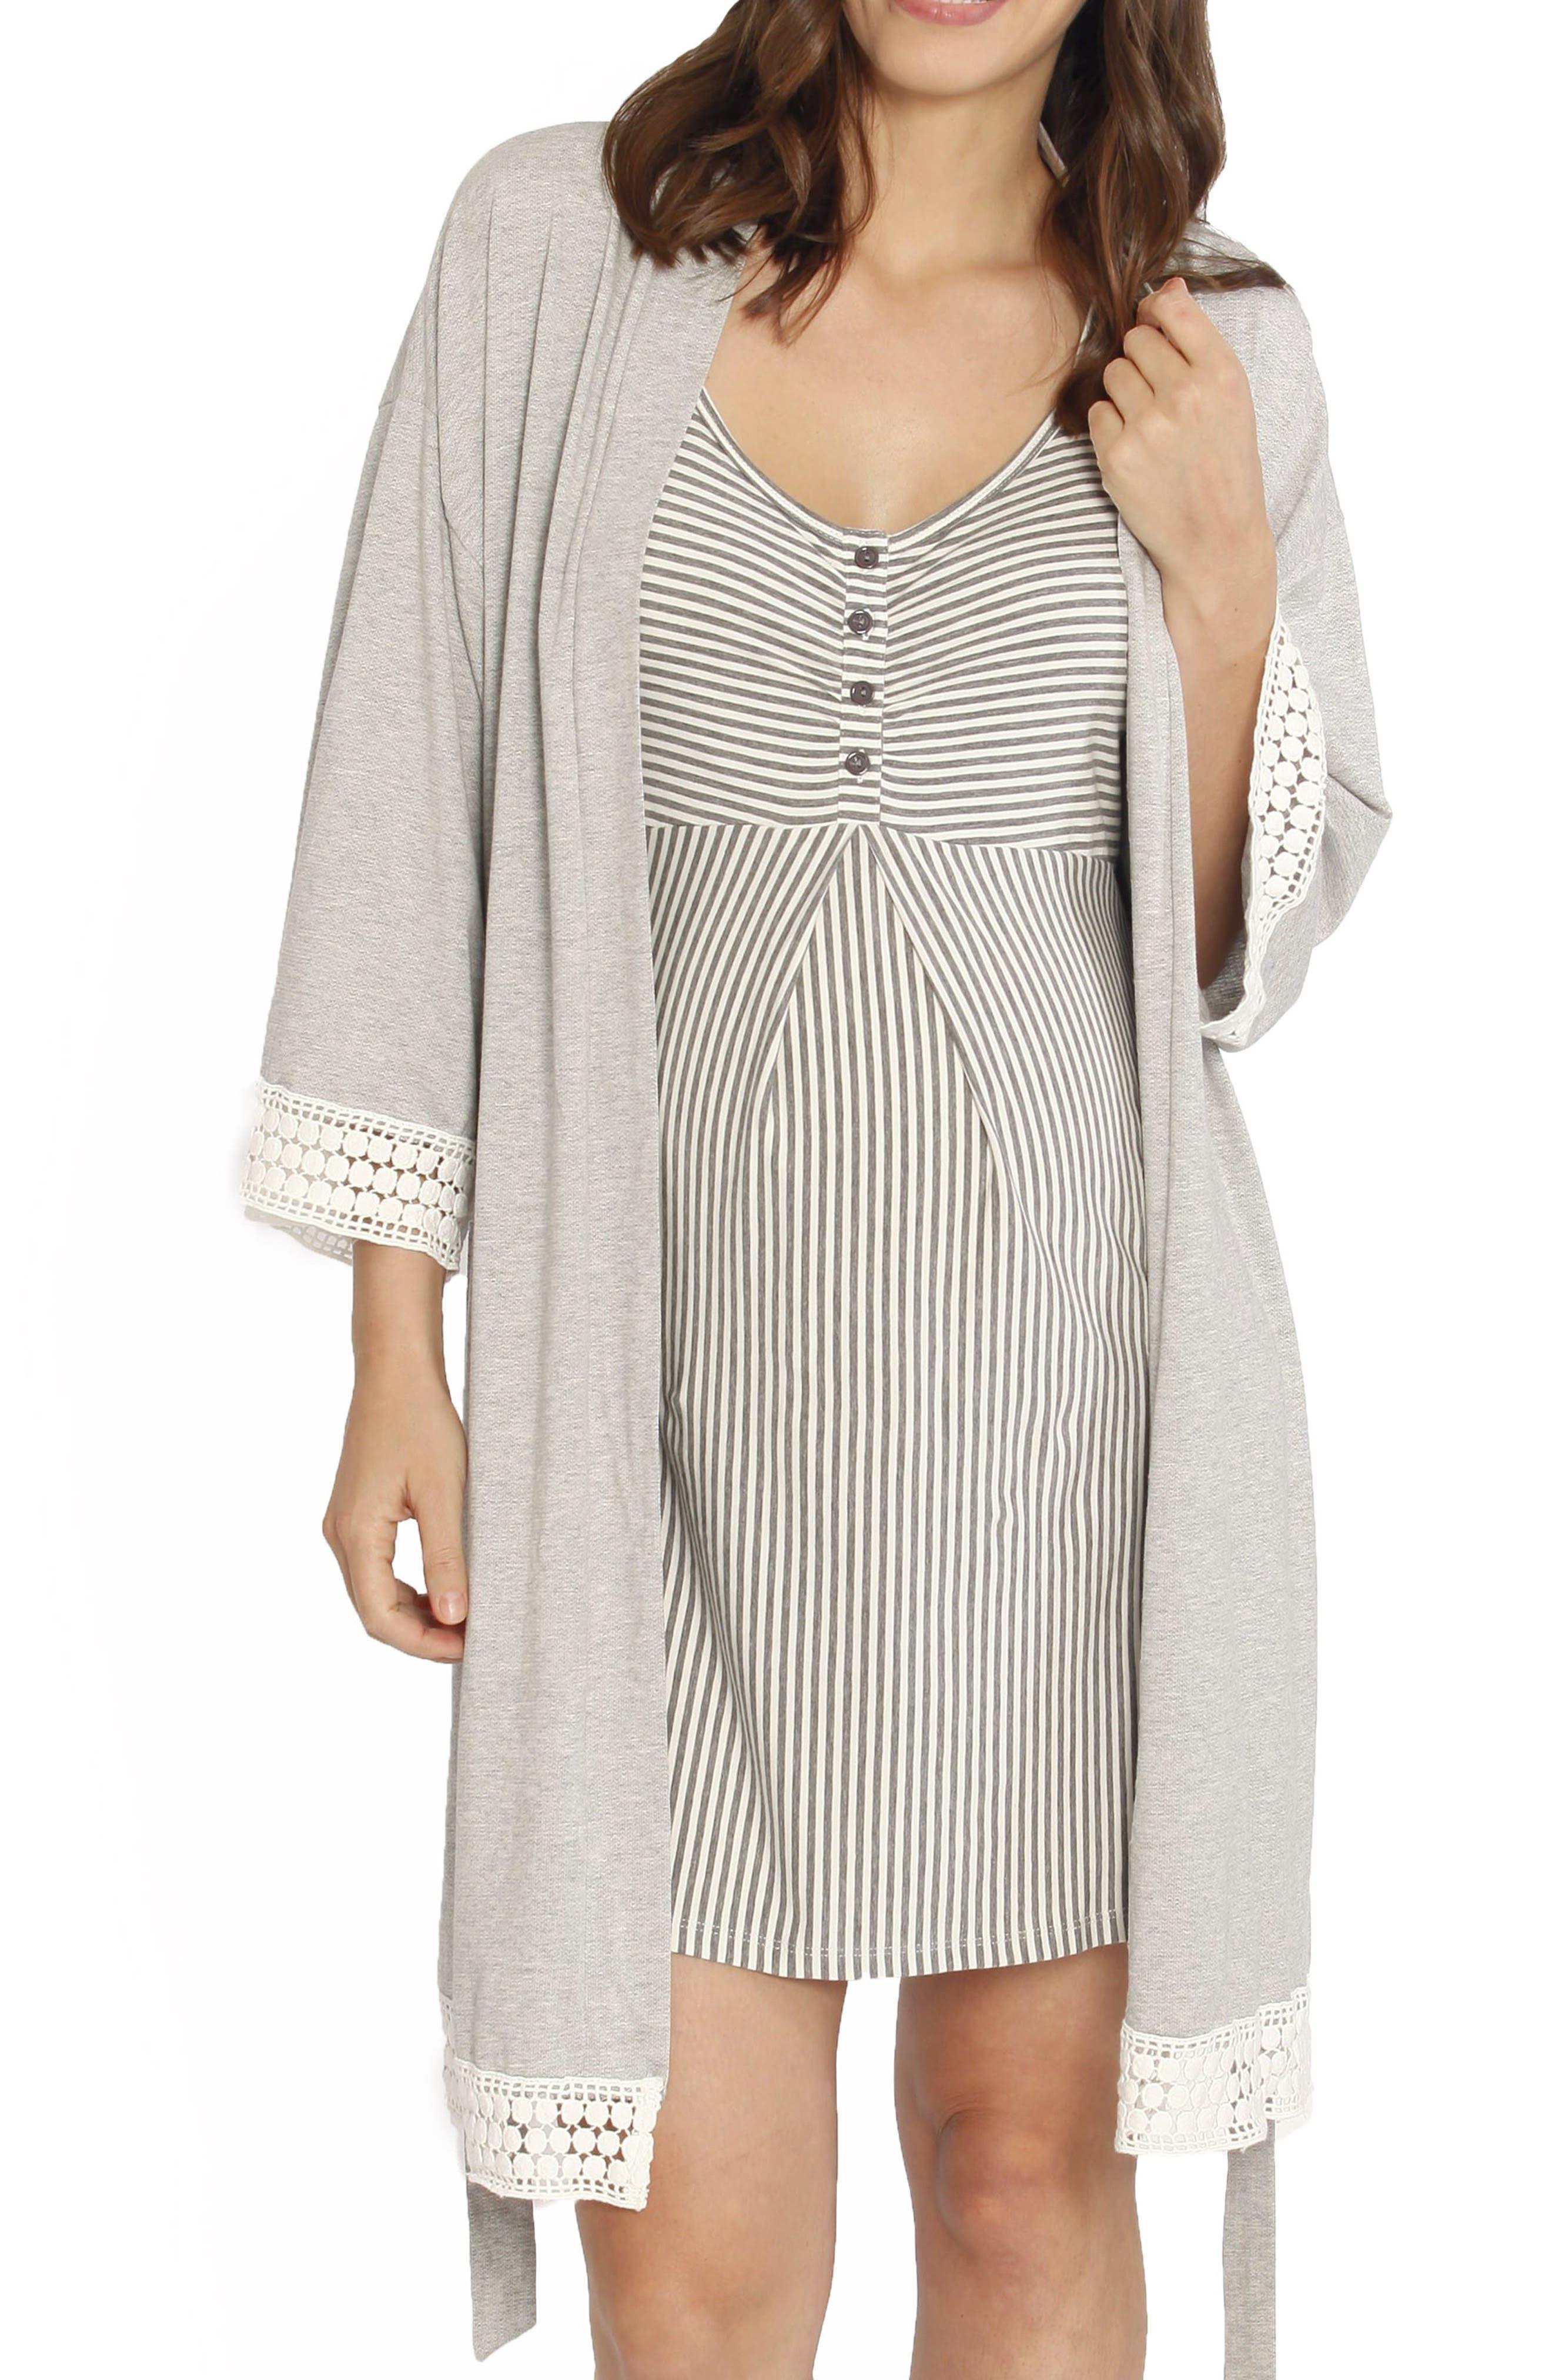 Nursing/Maternity Dress, Robe & Baby Wrap Set,                             Main thumbnail 1, color,                             GREY/ WHITE